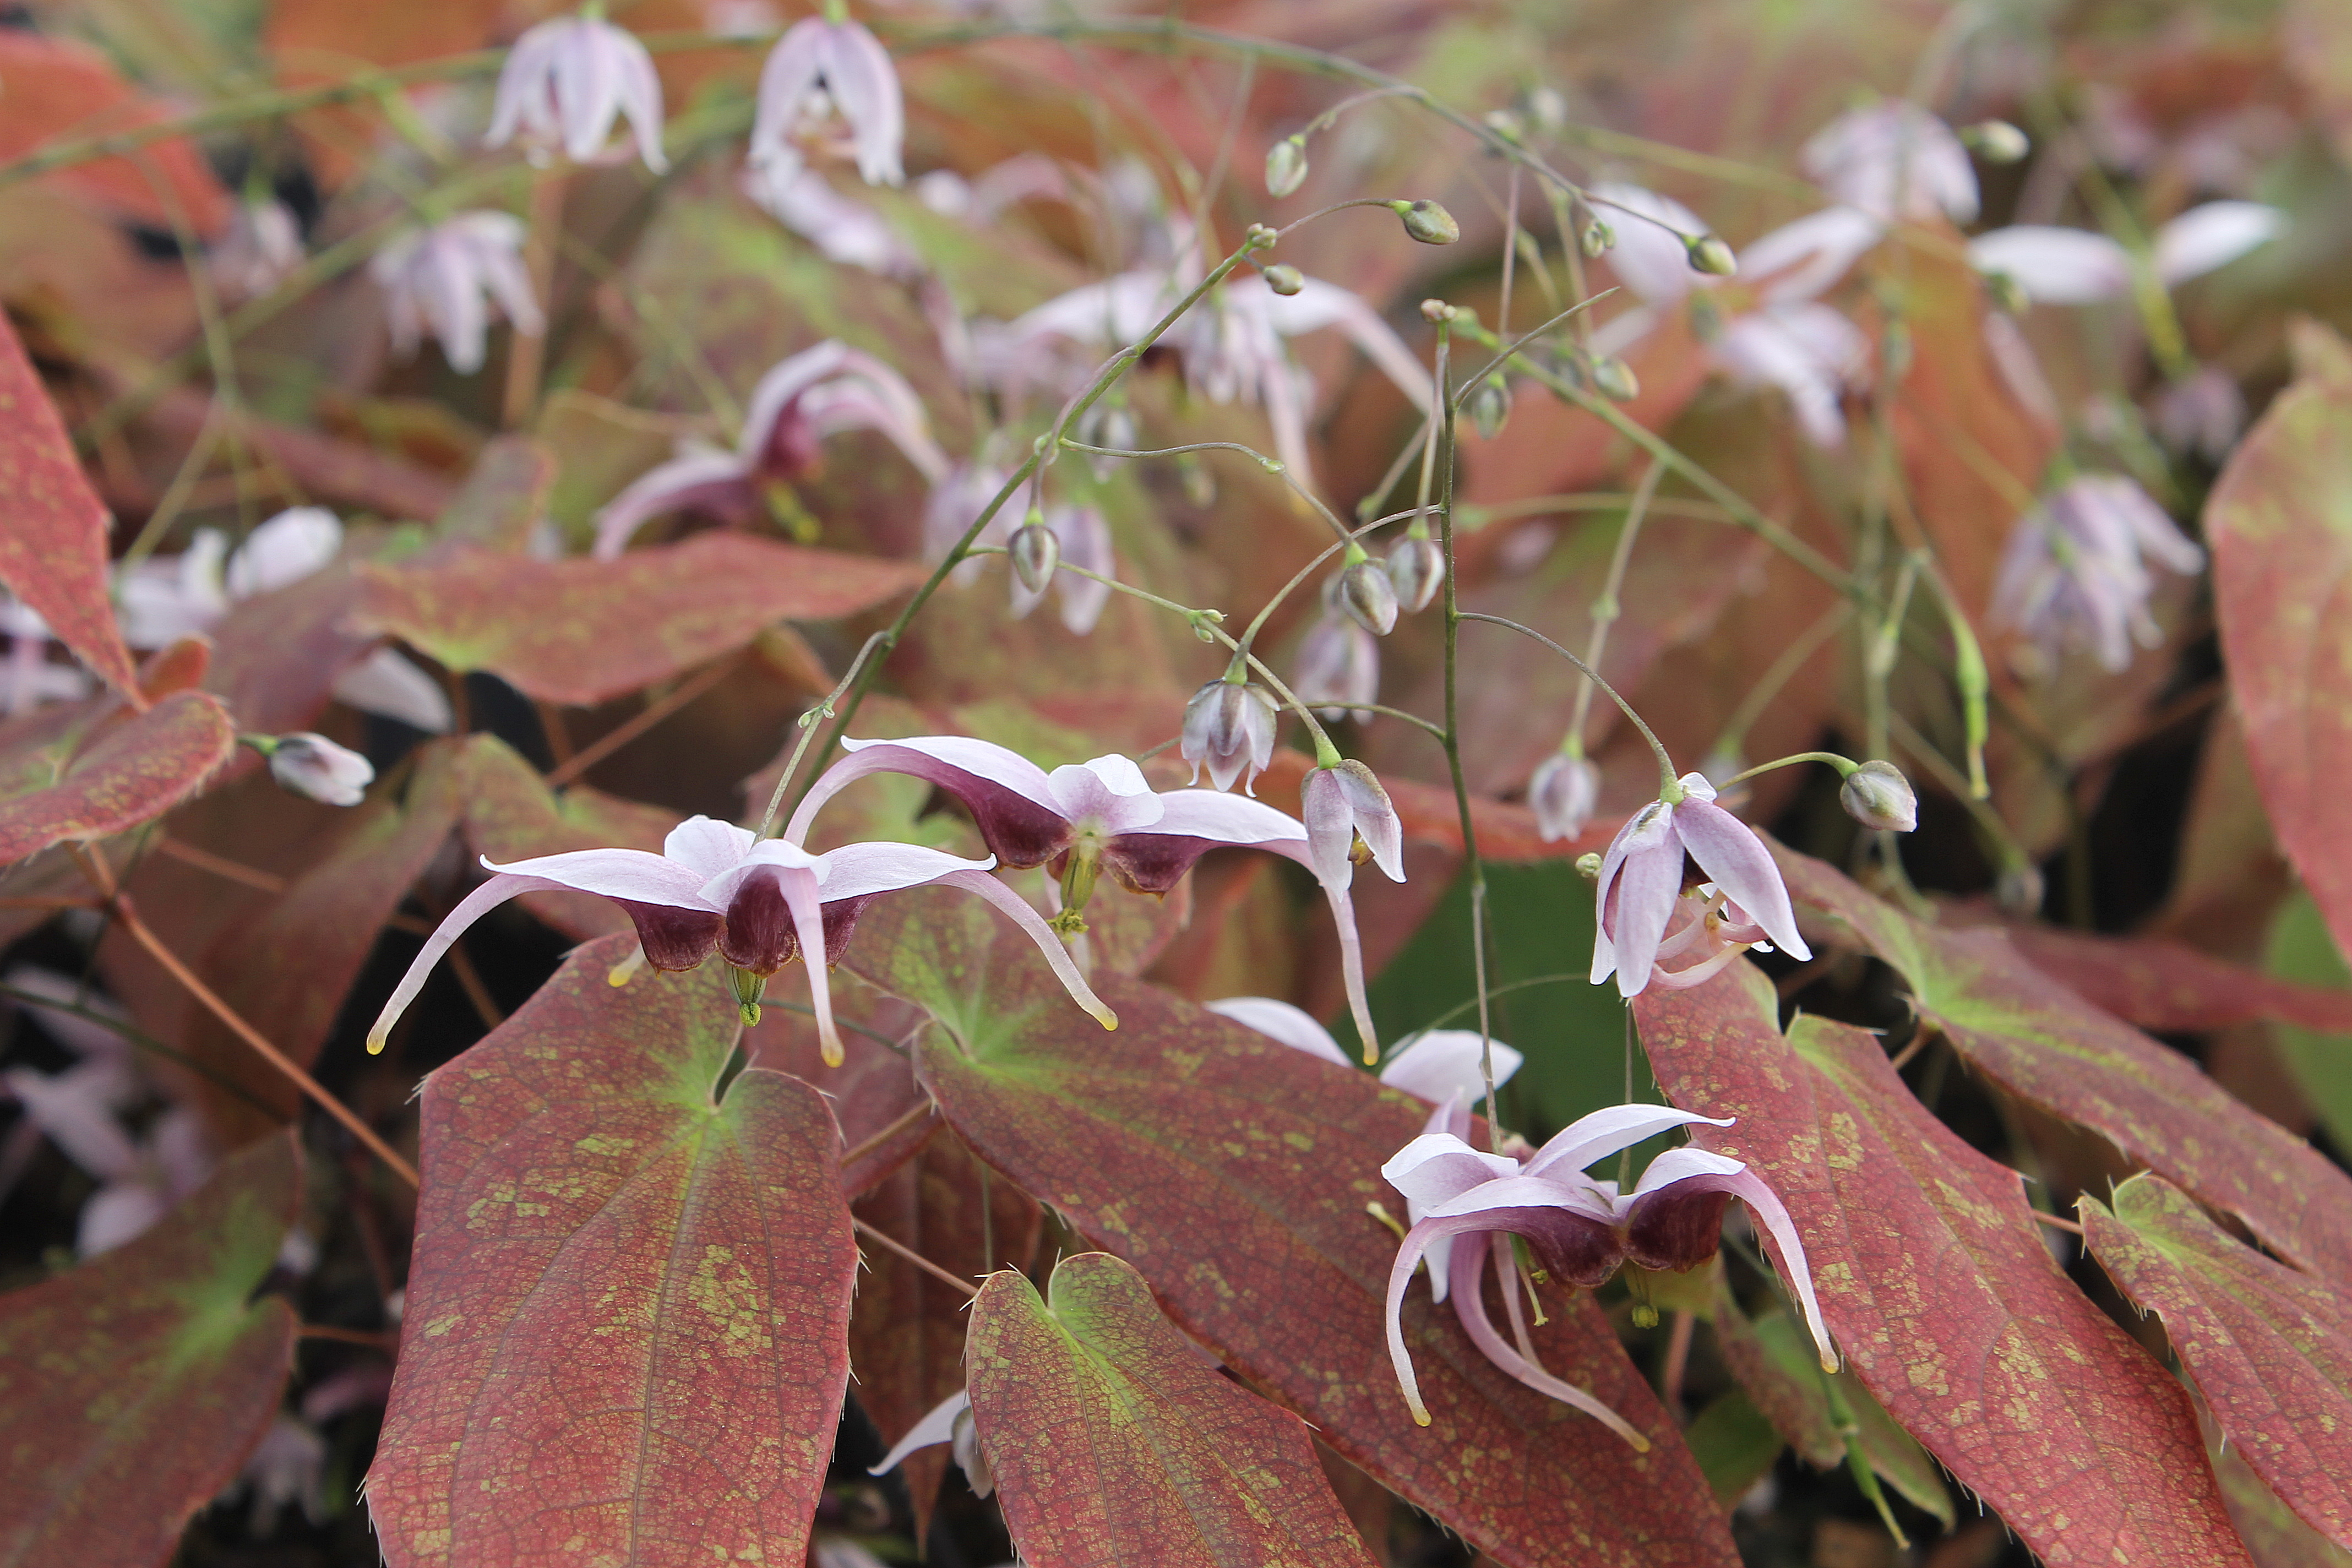 Epimedium acuminatum 'Ruby Shan' @ JLBG - a 1996 Dan Hinkley/Heronswood Nursery introduction of a collection from Sichuan, China; evergreen